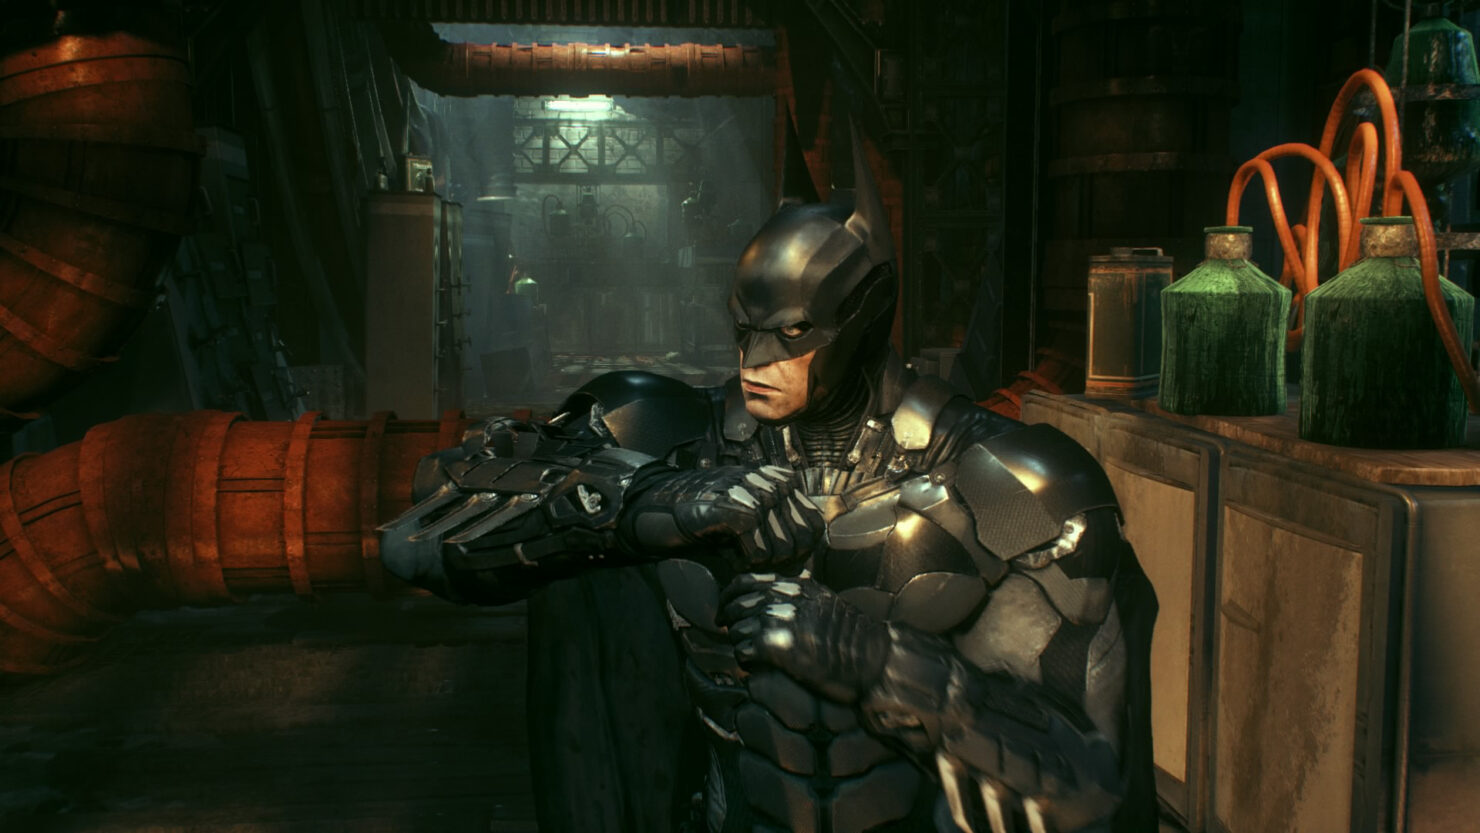 batman-arkham-knight-ps4-9